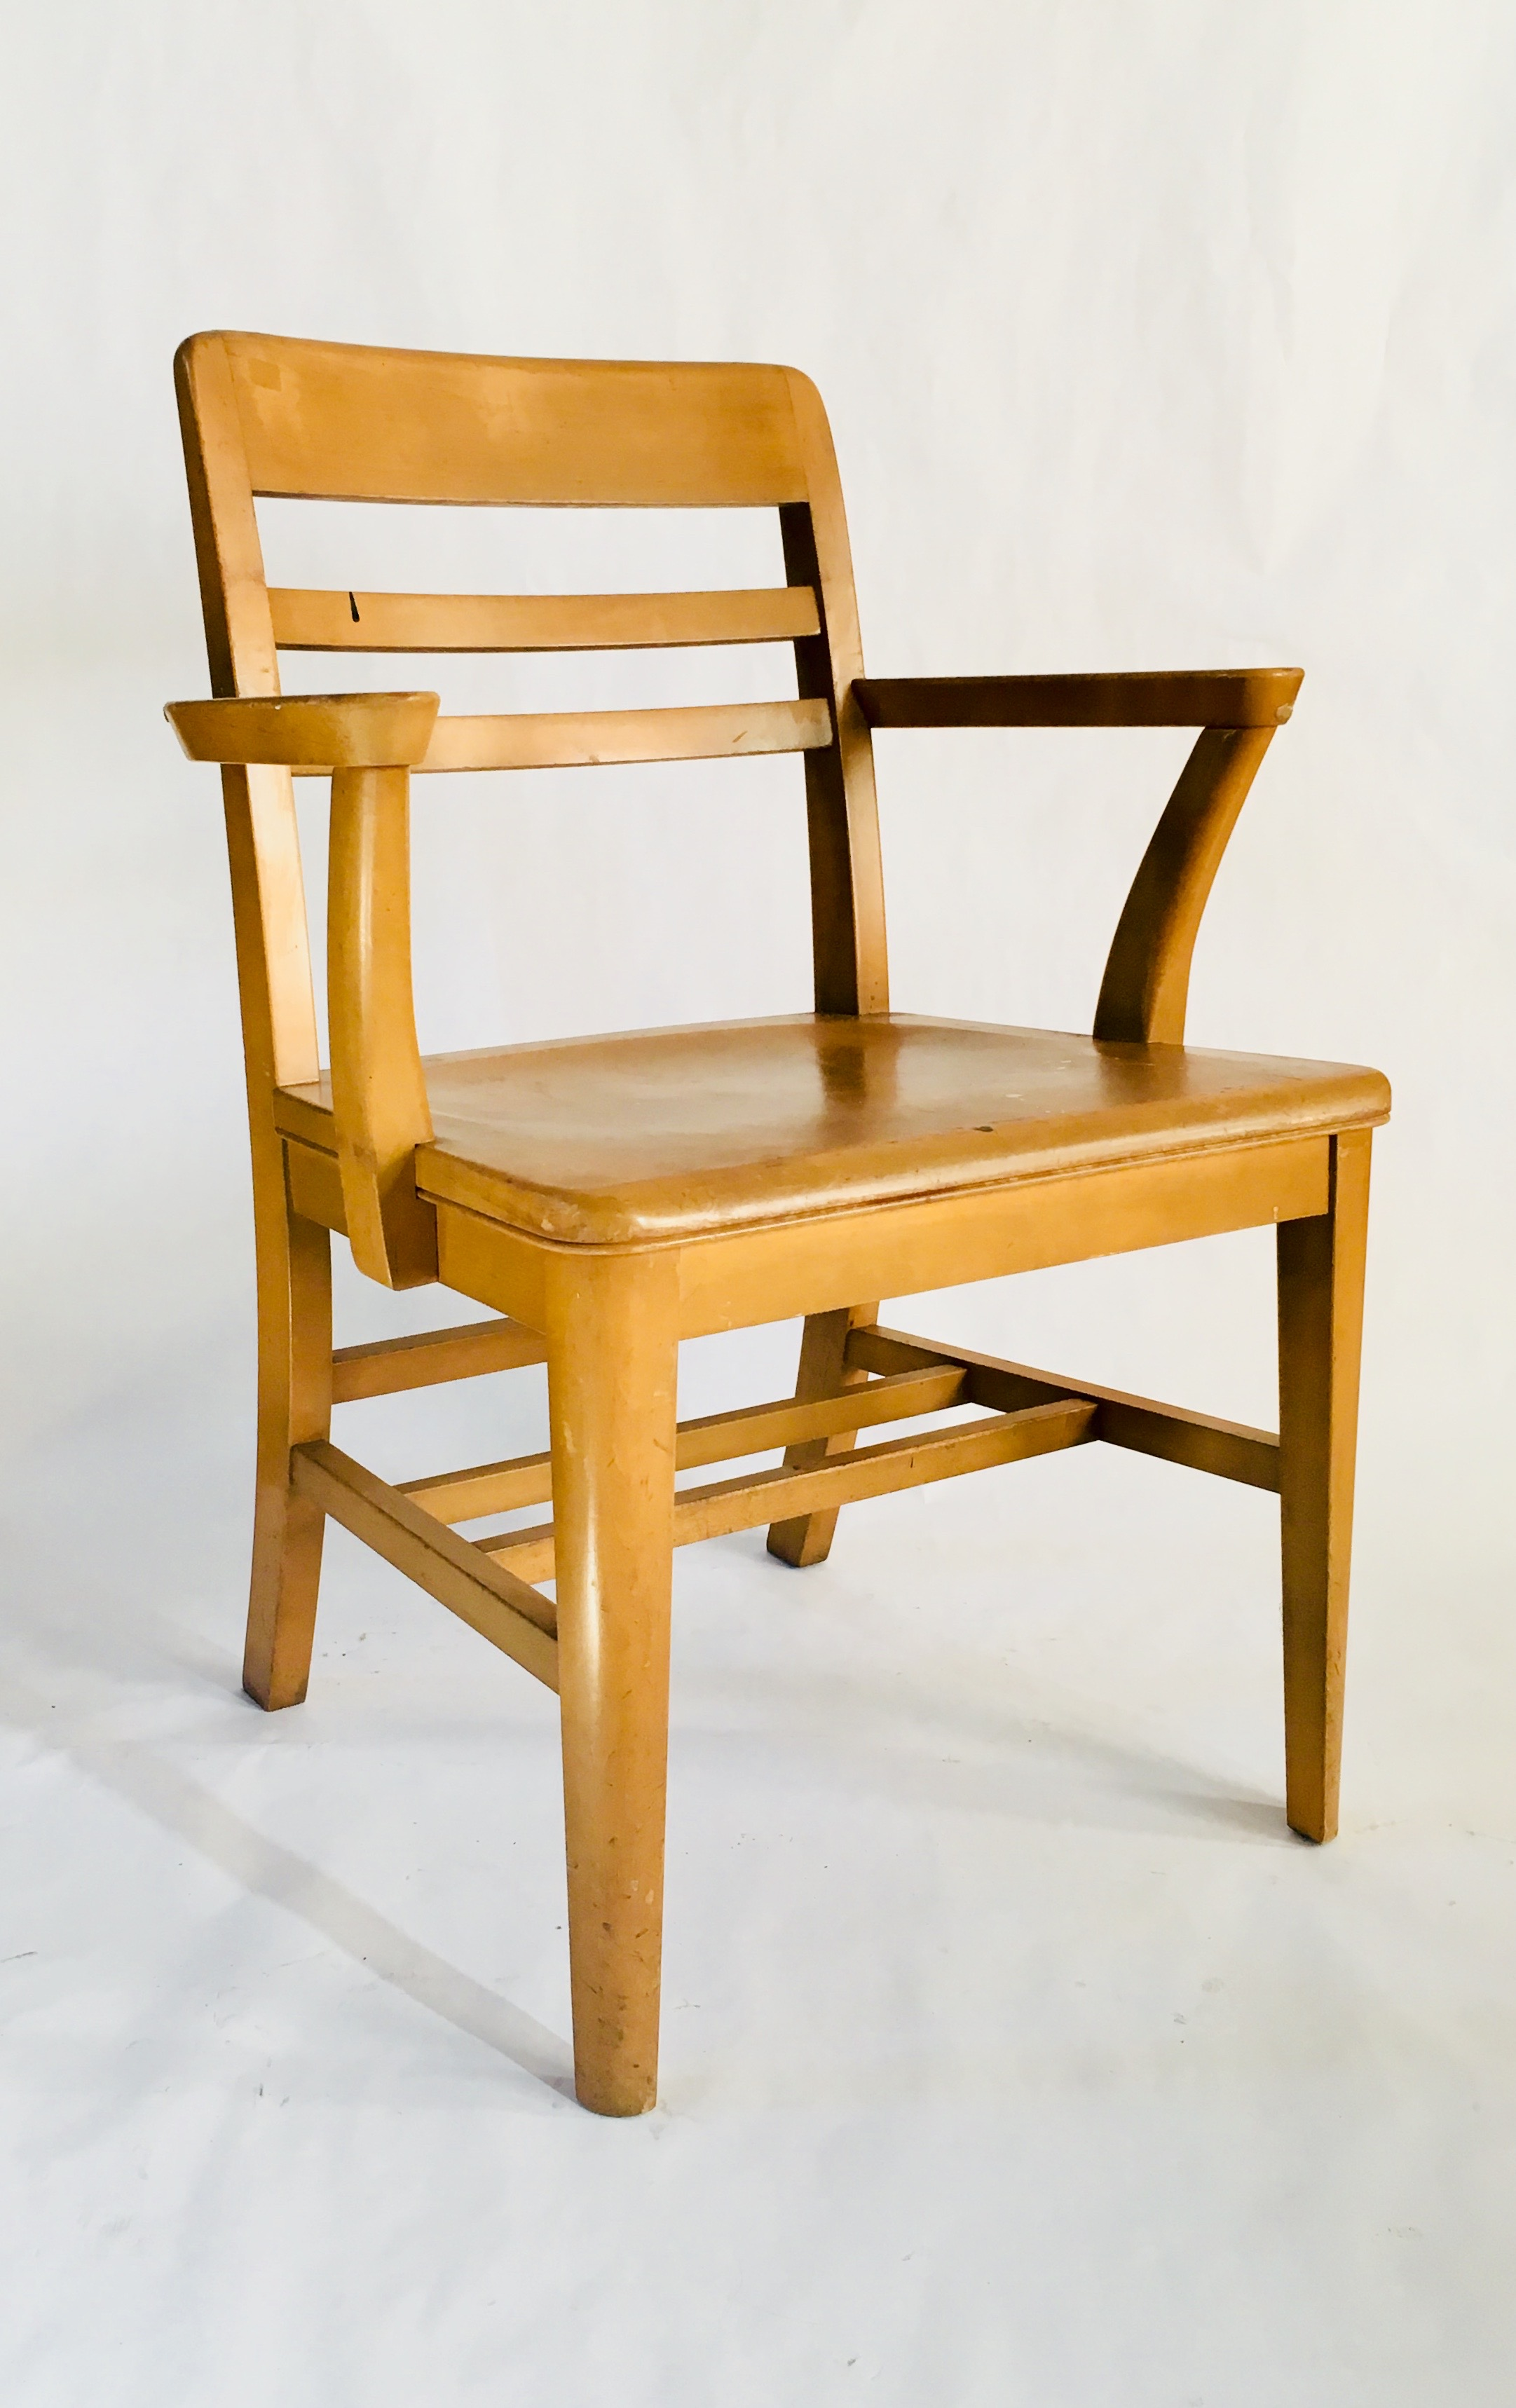 wooden library chair french dining vintage by gunlocke co kyla coburn 10161 jpg